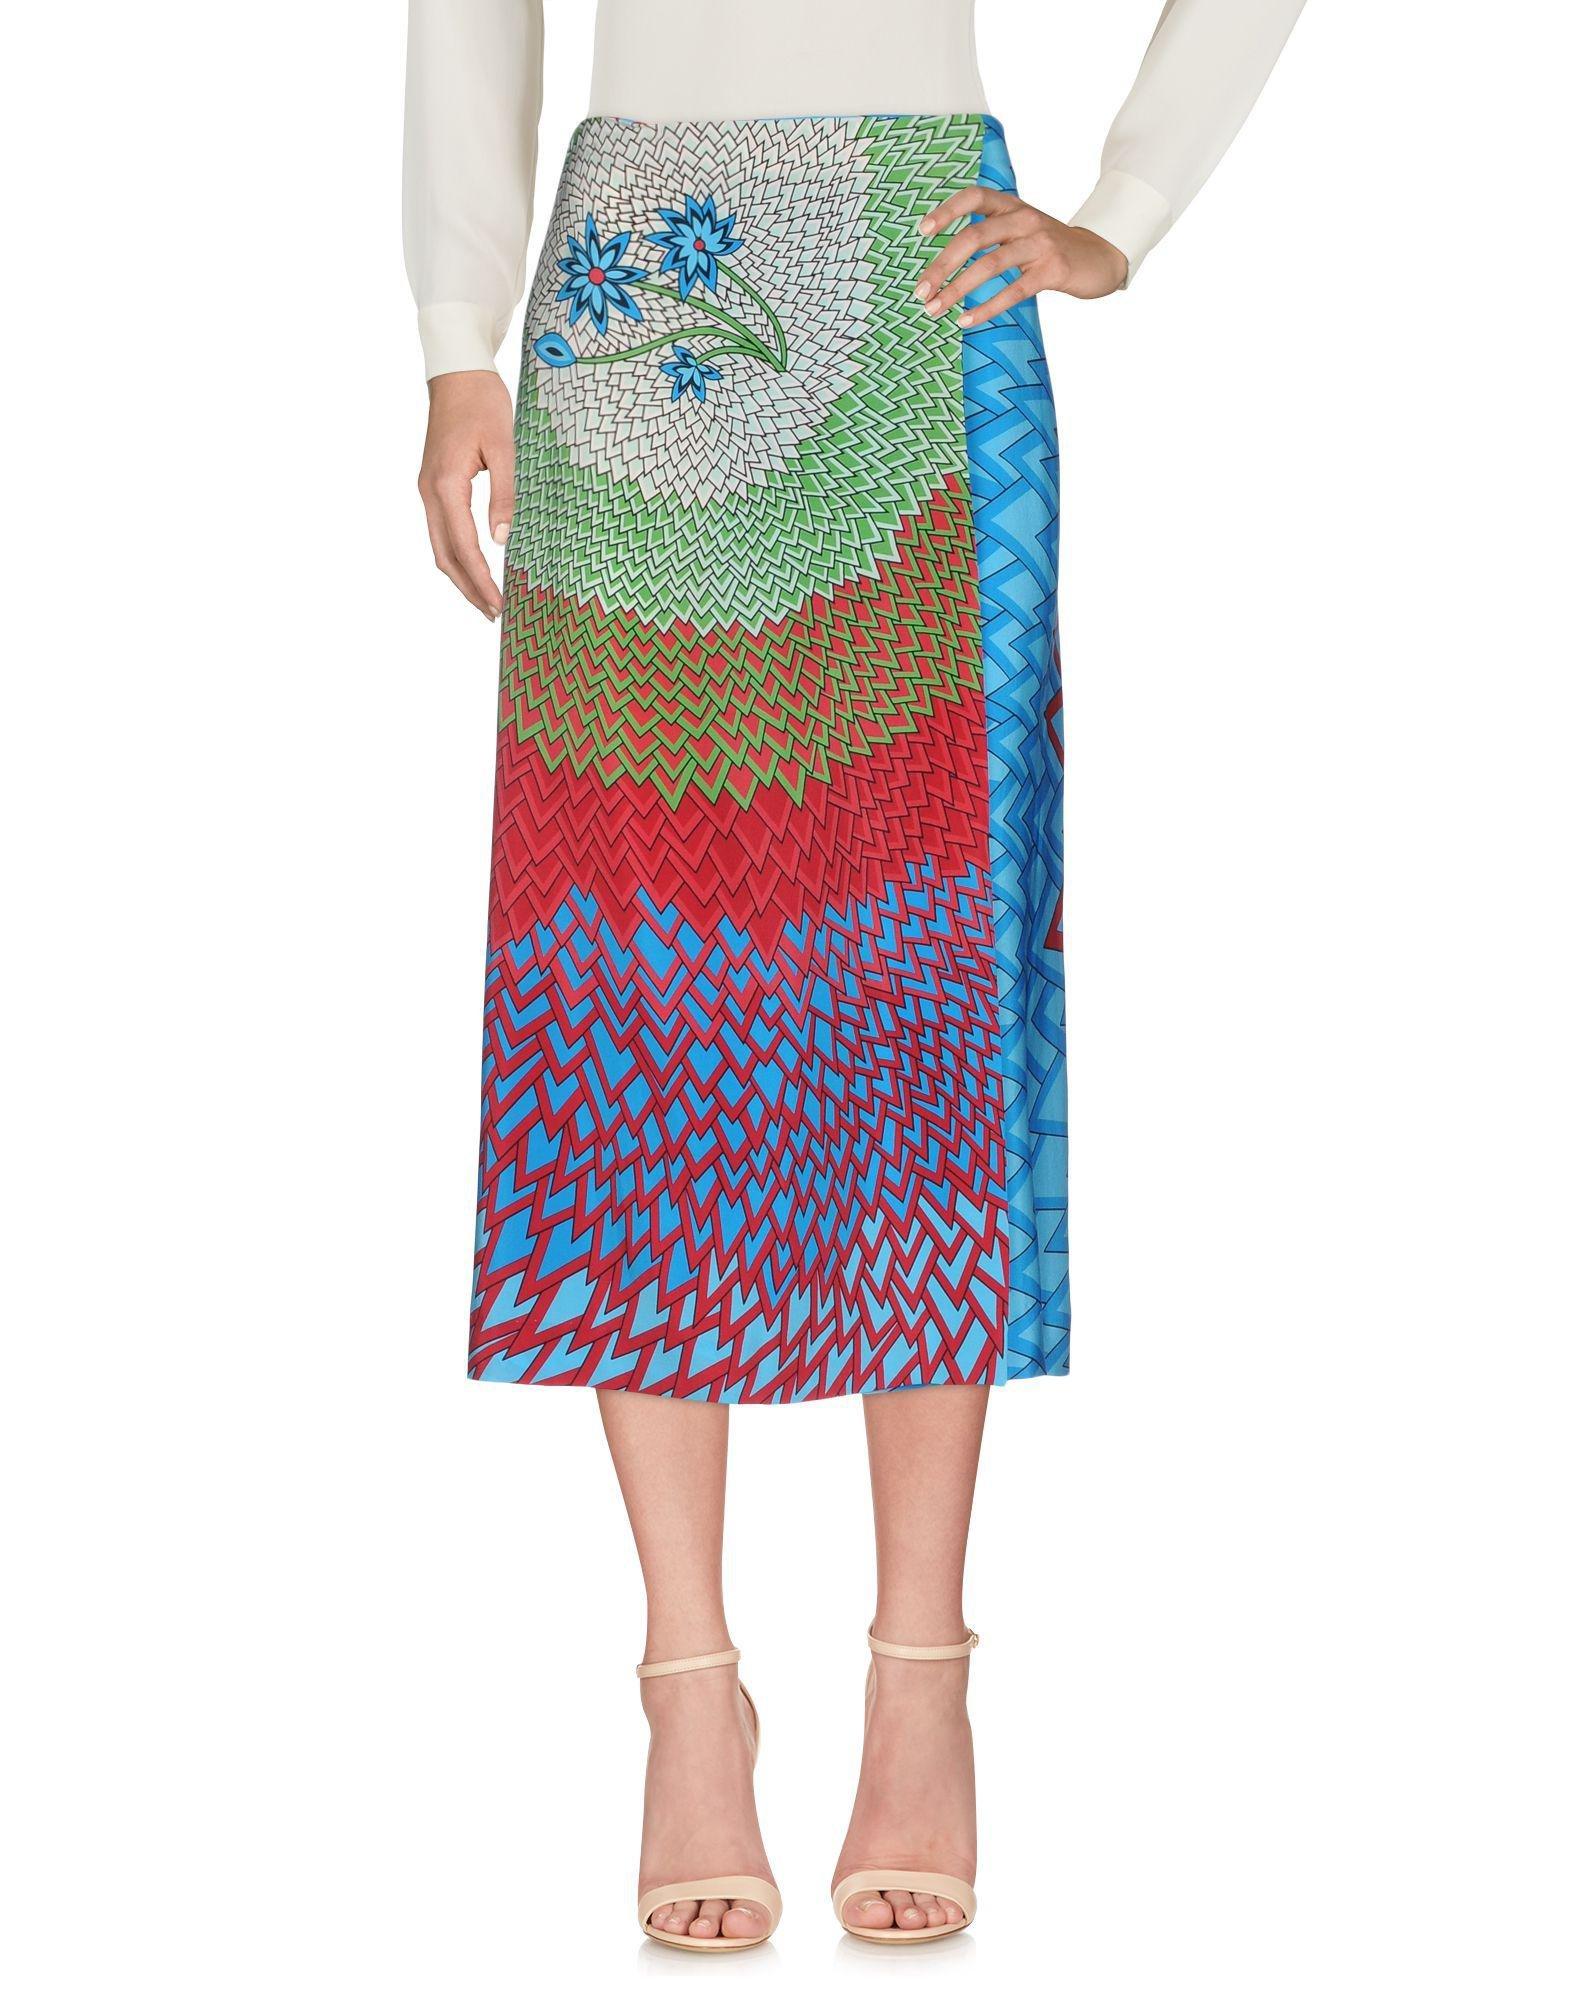 SKIRTS - 3/4 length skirts Roberta Di Camerino Genuine Online pkfYg6KAKQ